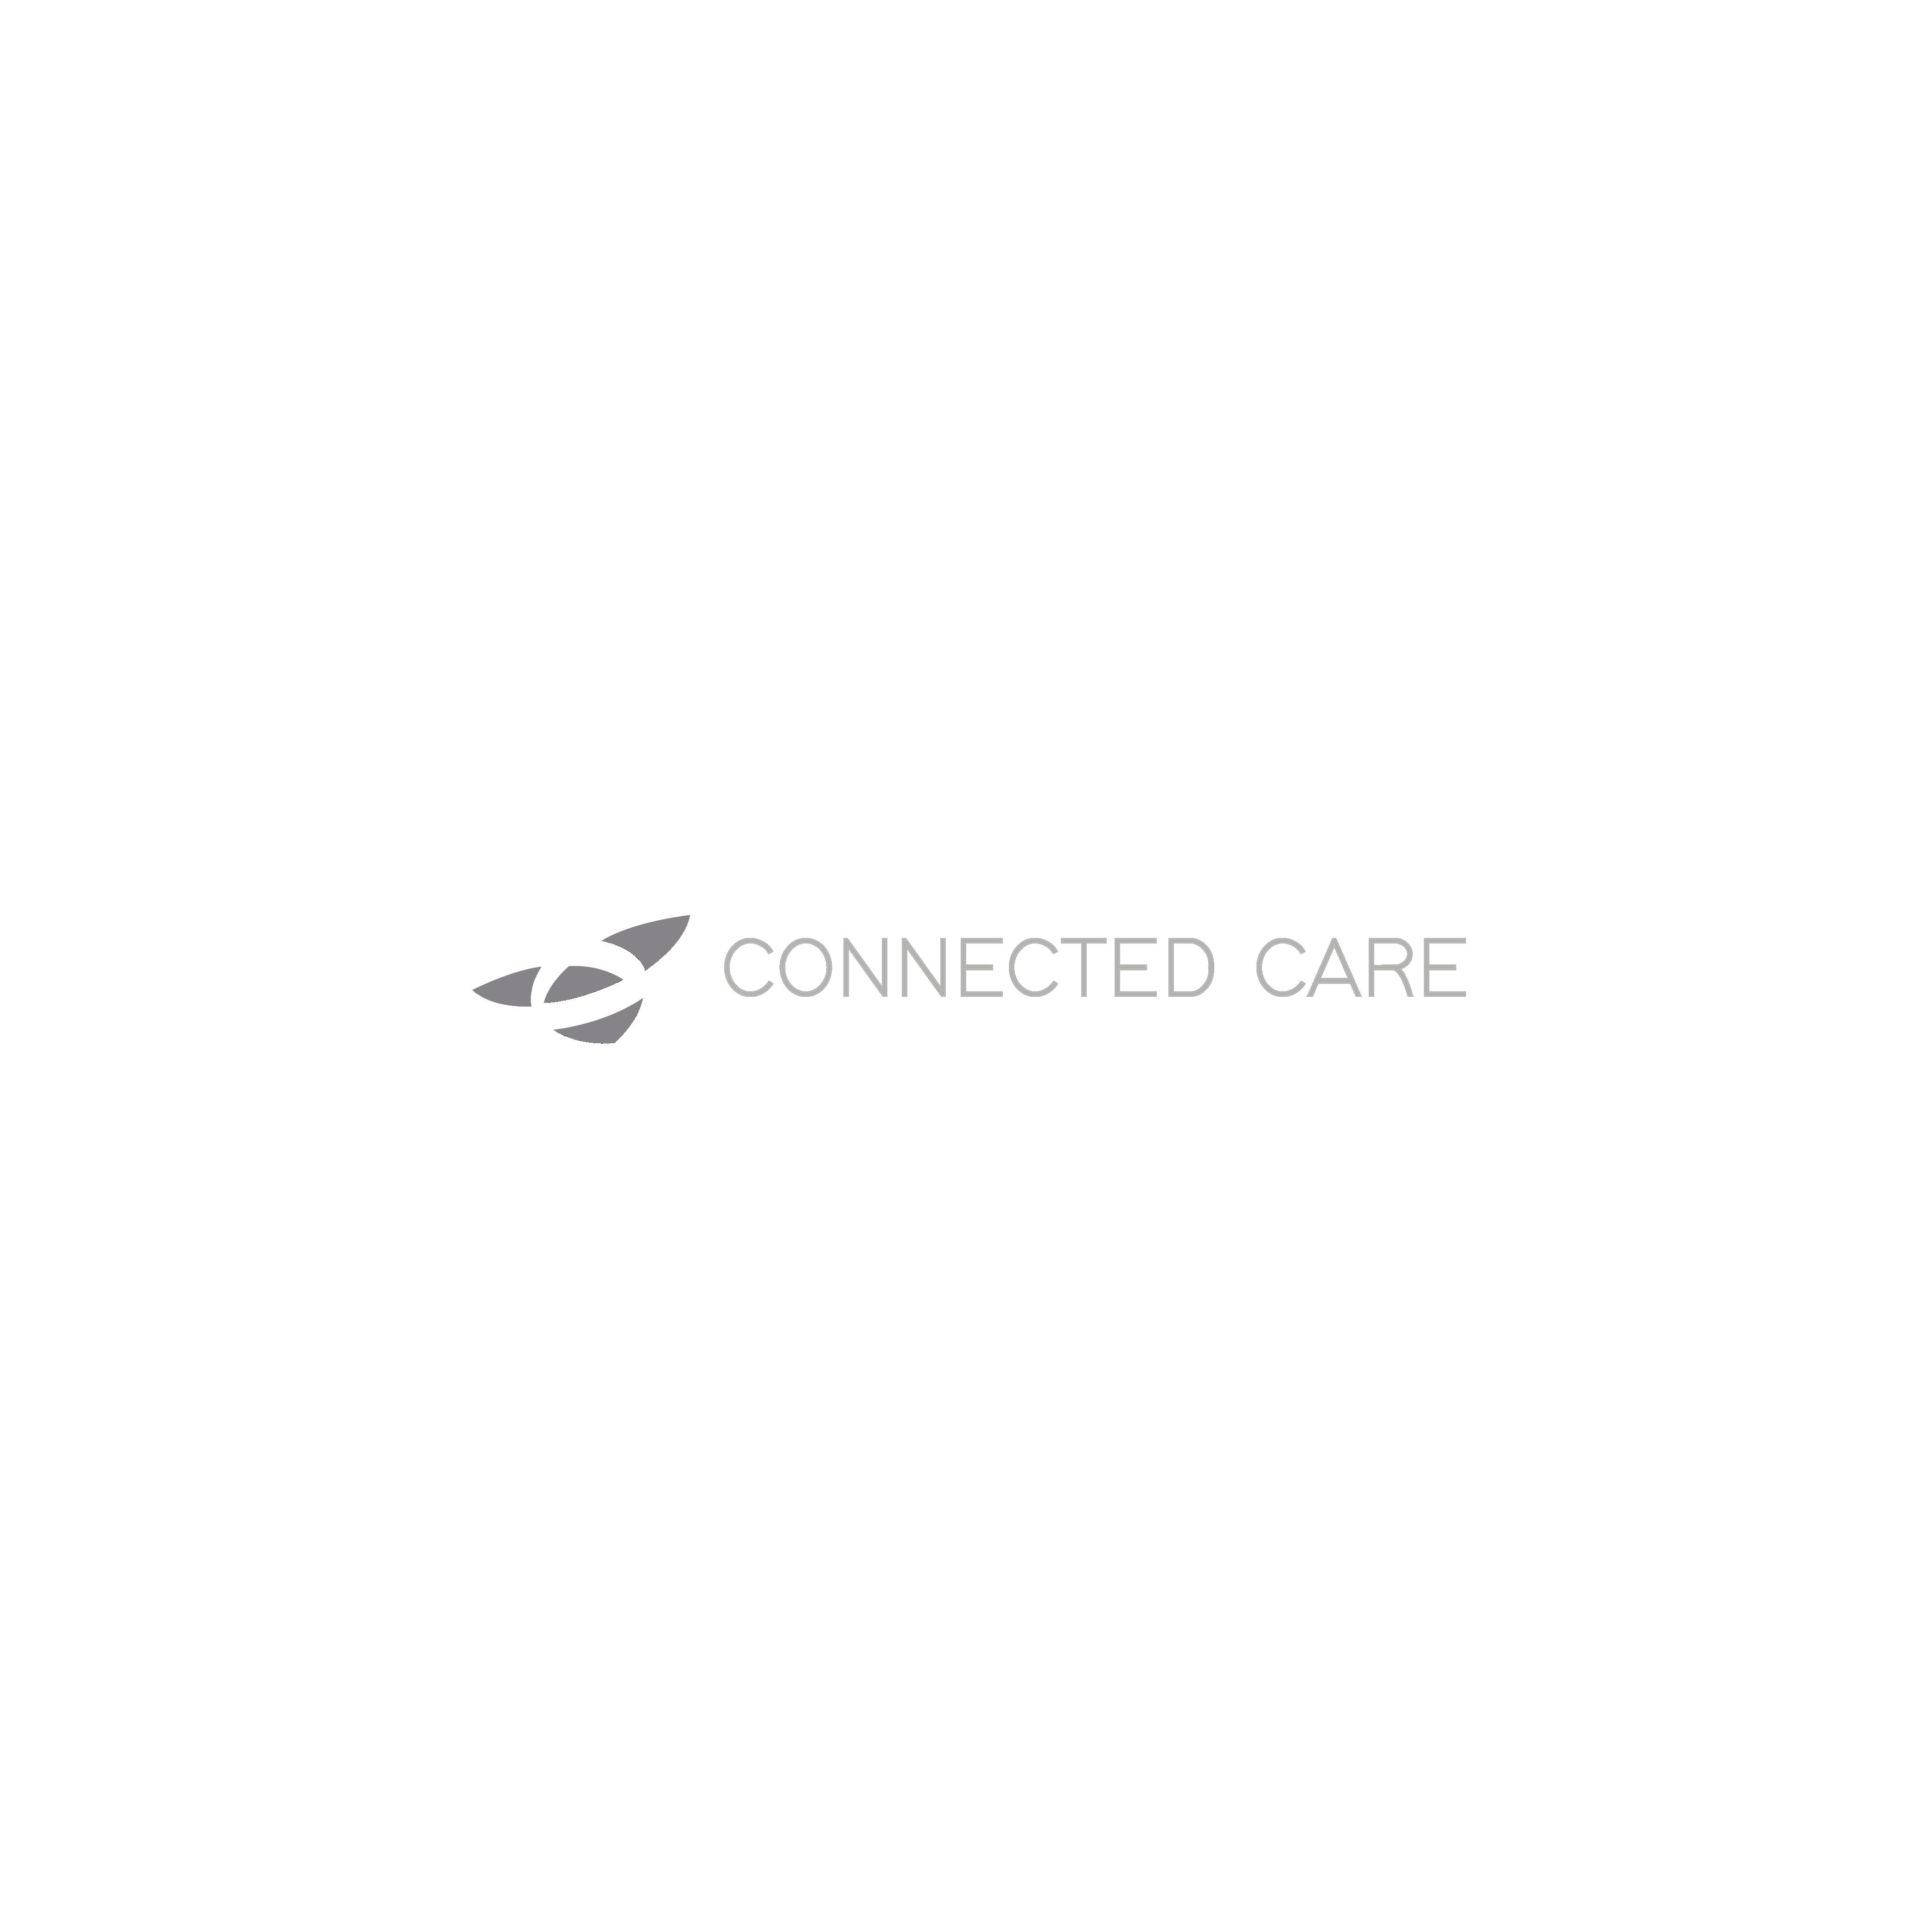 CHIROPRACTIC Center needs a powerful eye catching logo